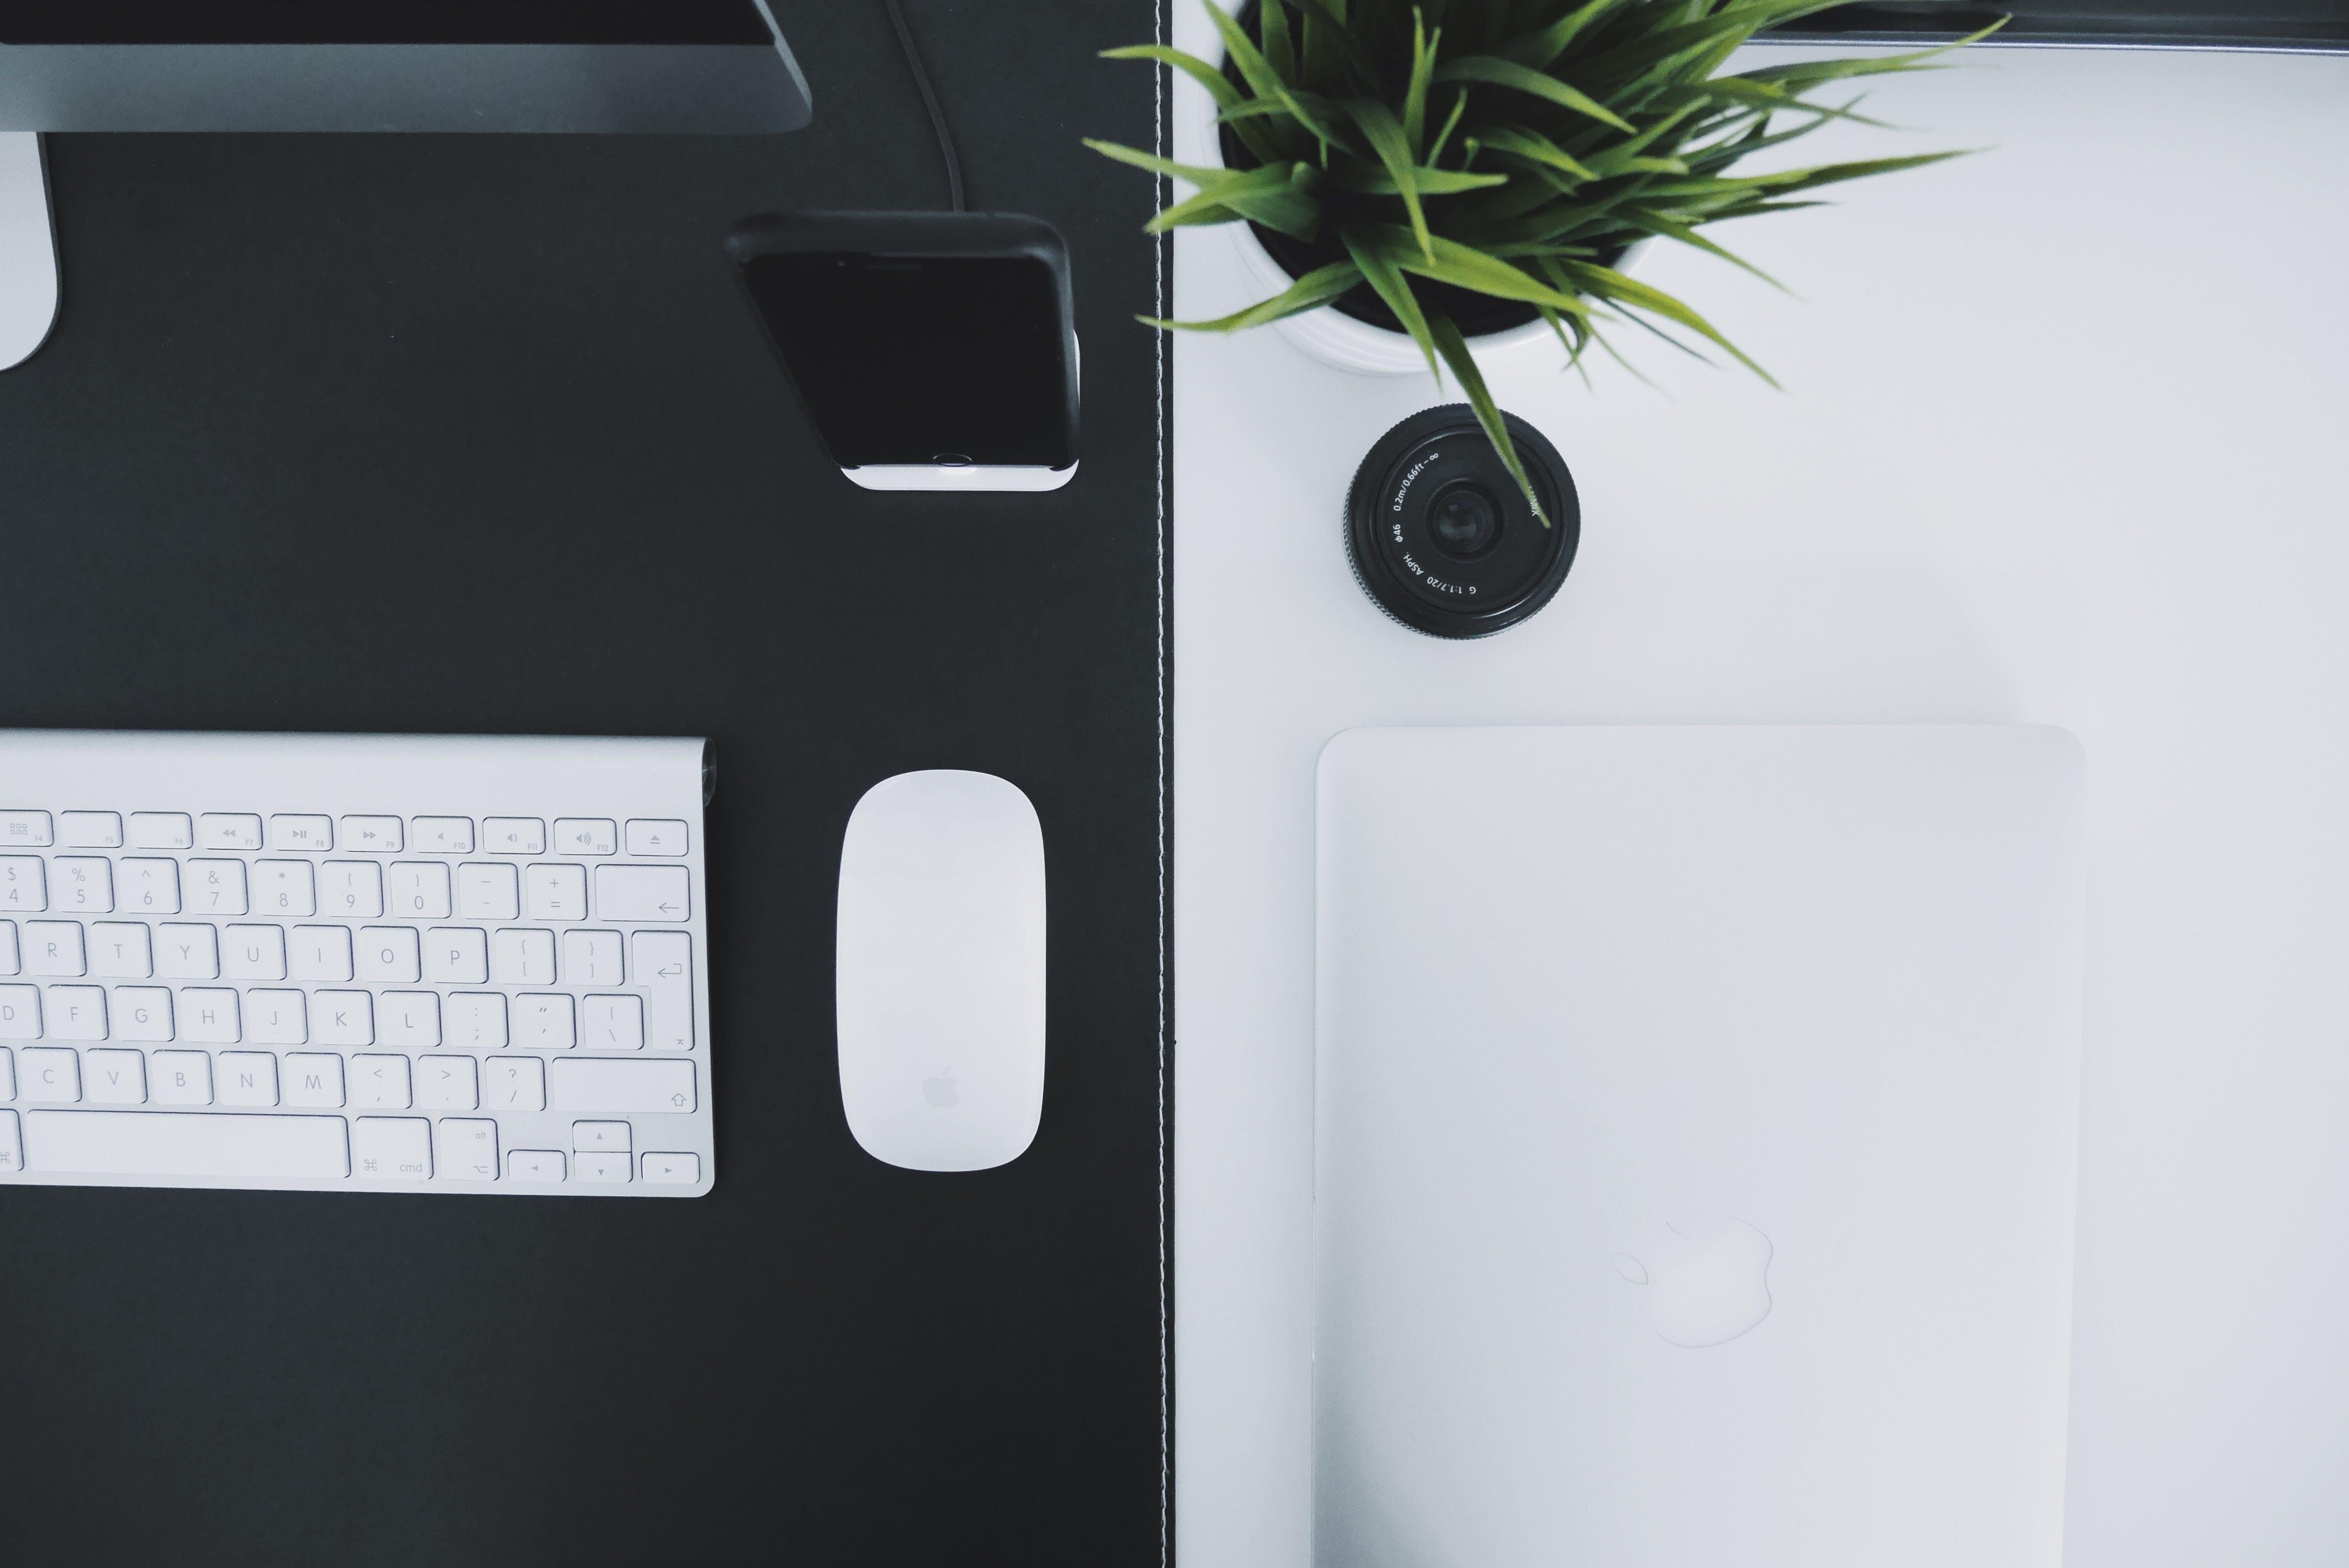 apple keyboard, apple mouse, black